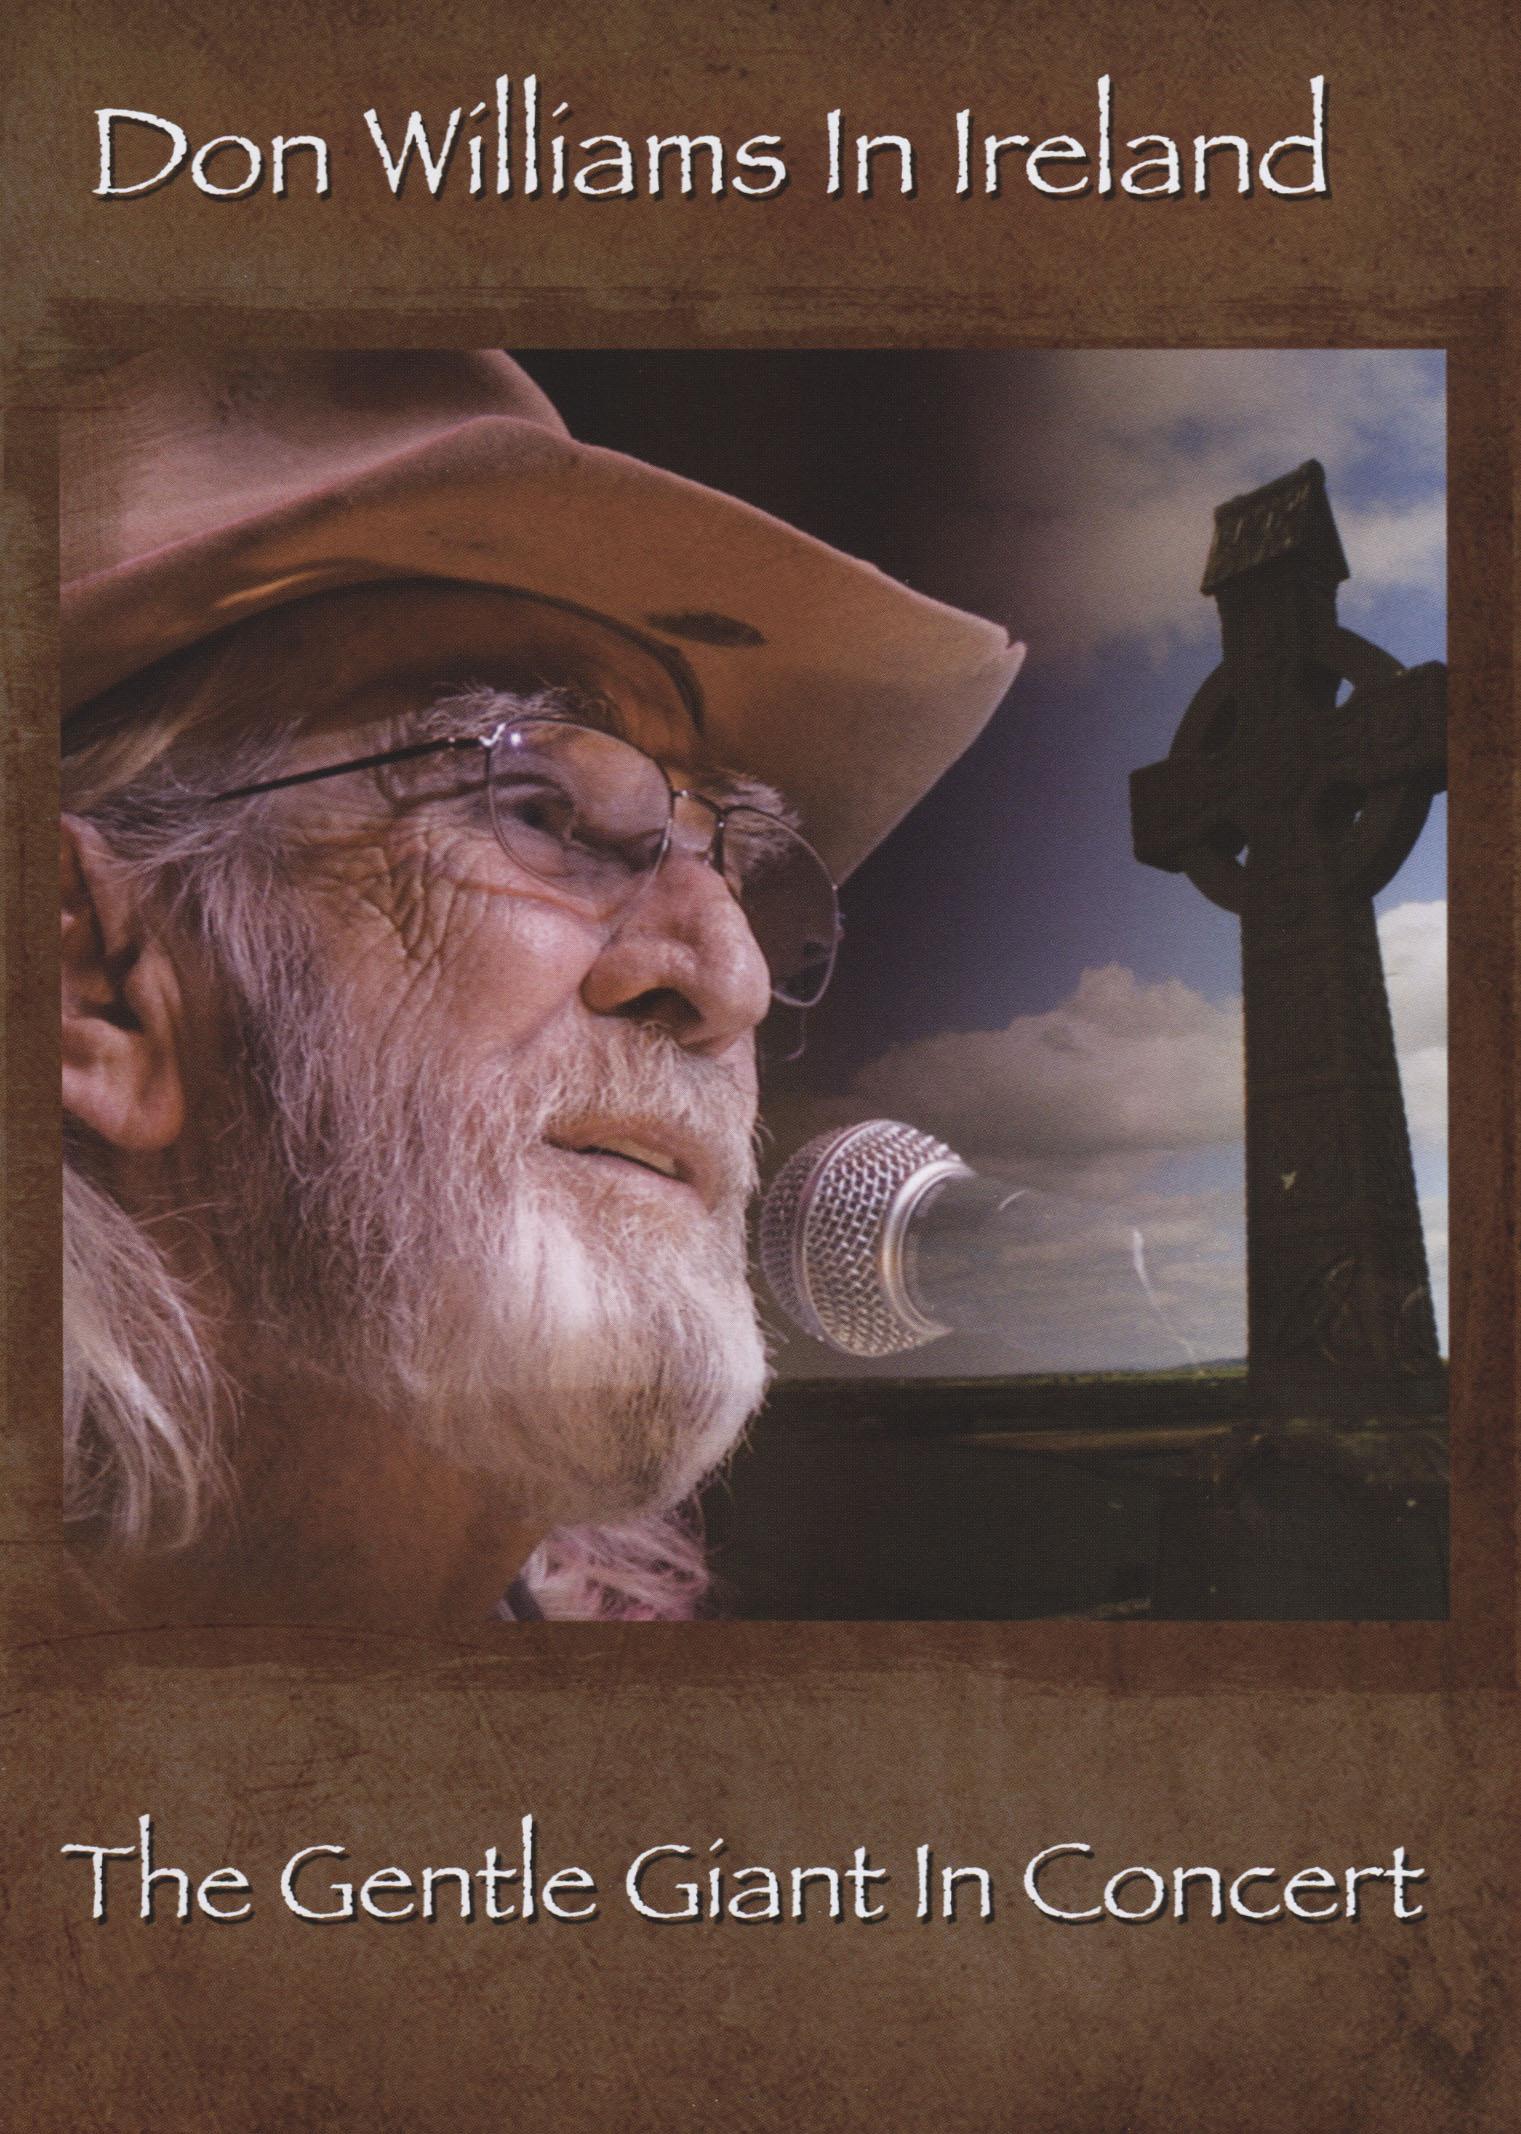 Don Williams: In Ireland - The Gentle Giant in Concert